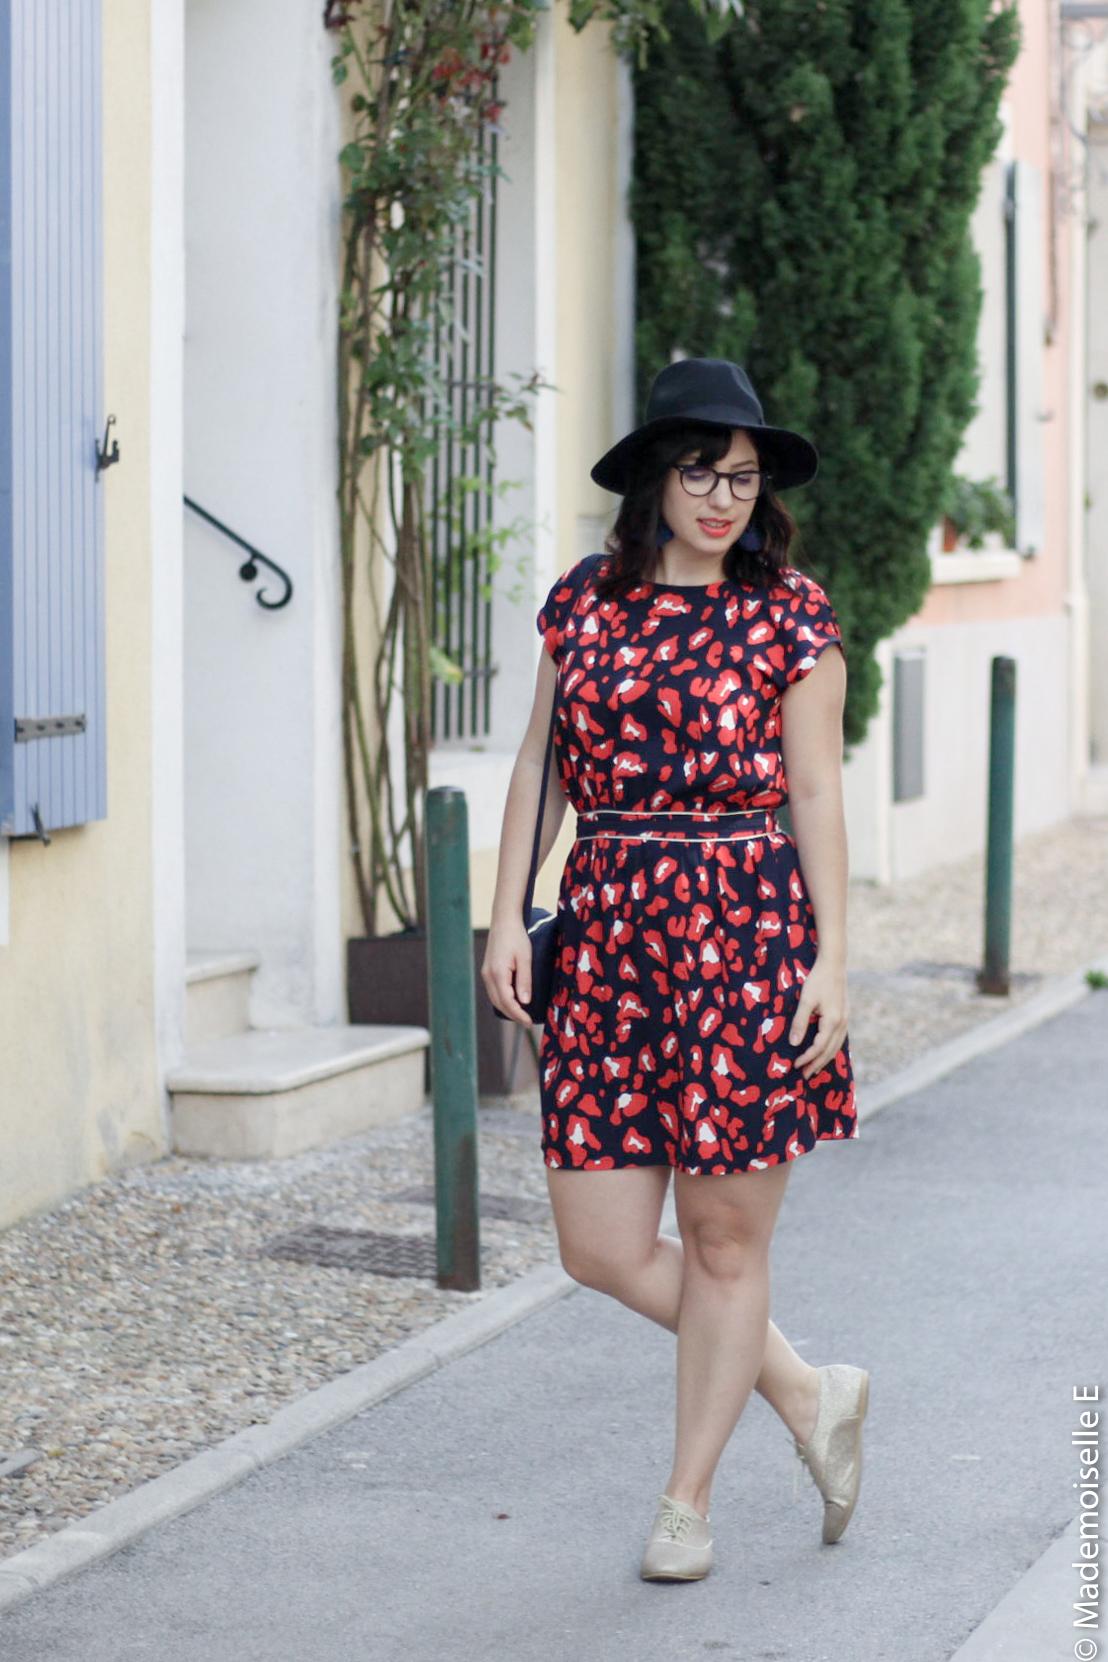 robe leopard tendance 2018 9 mademoiselle-e